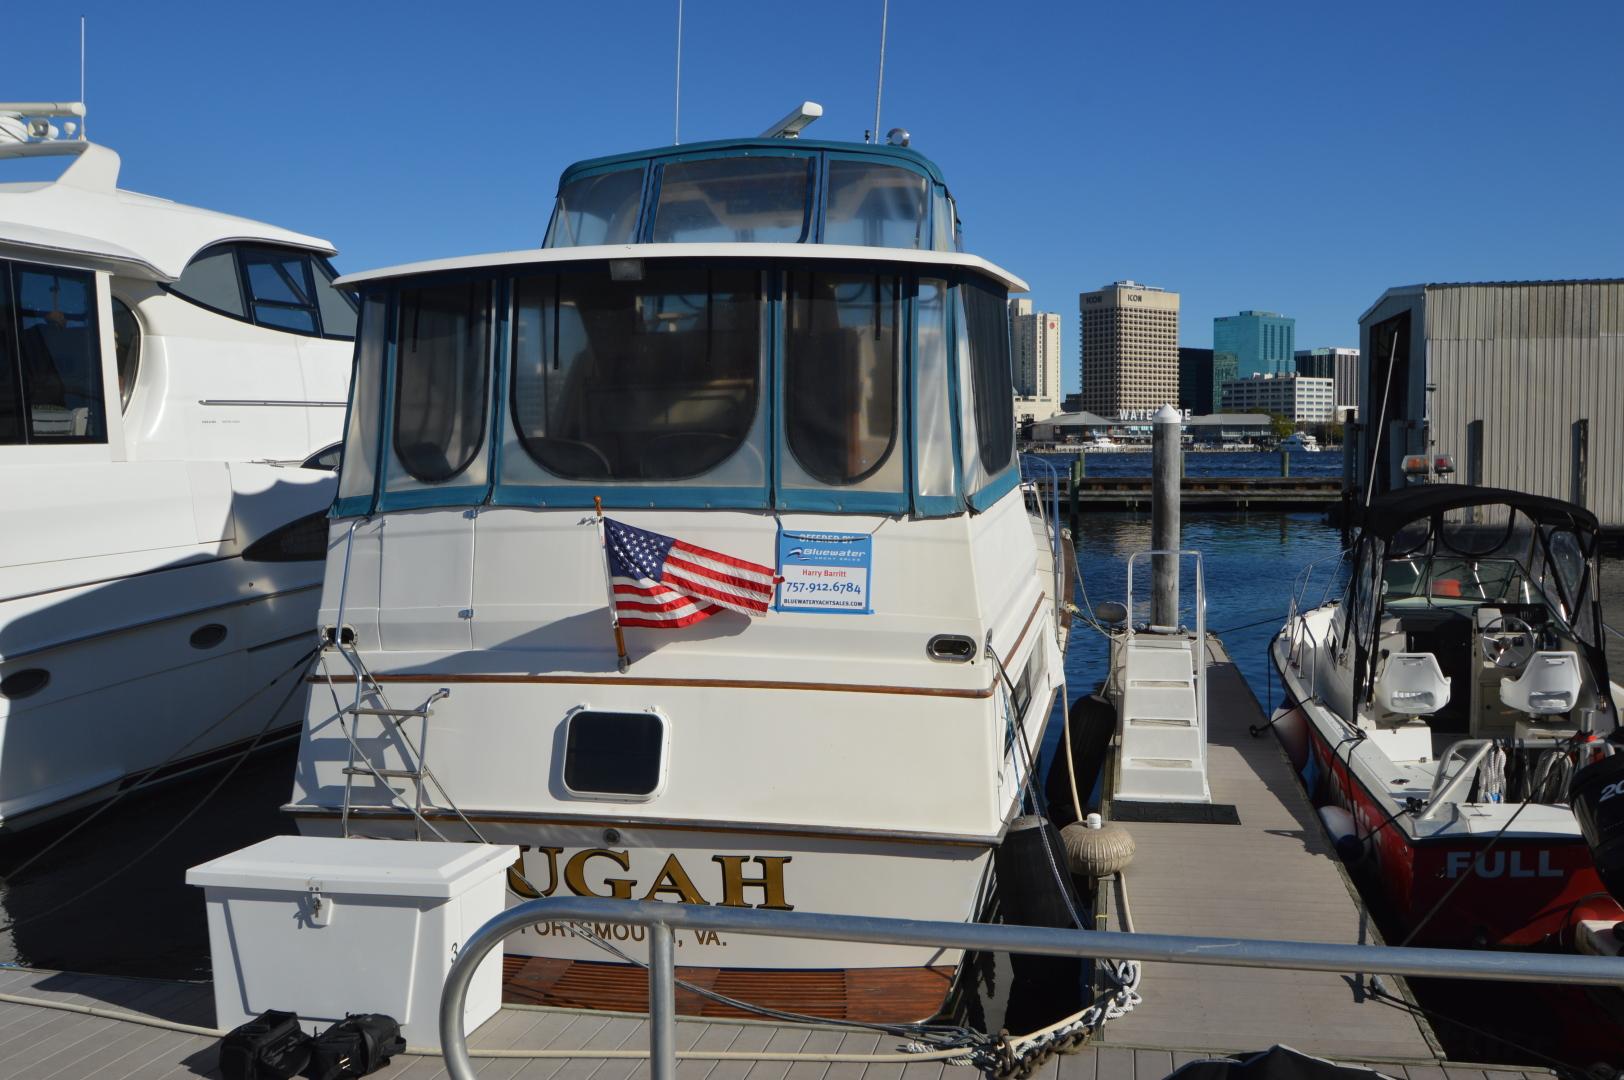 Ocean Yachts-46 Sunliner 1986-Sugah Portsmouth-Virginia-United States-1555483 | Thumbnail